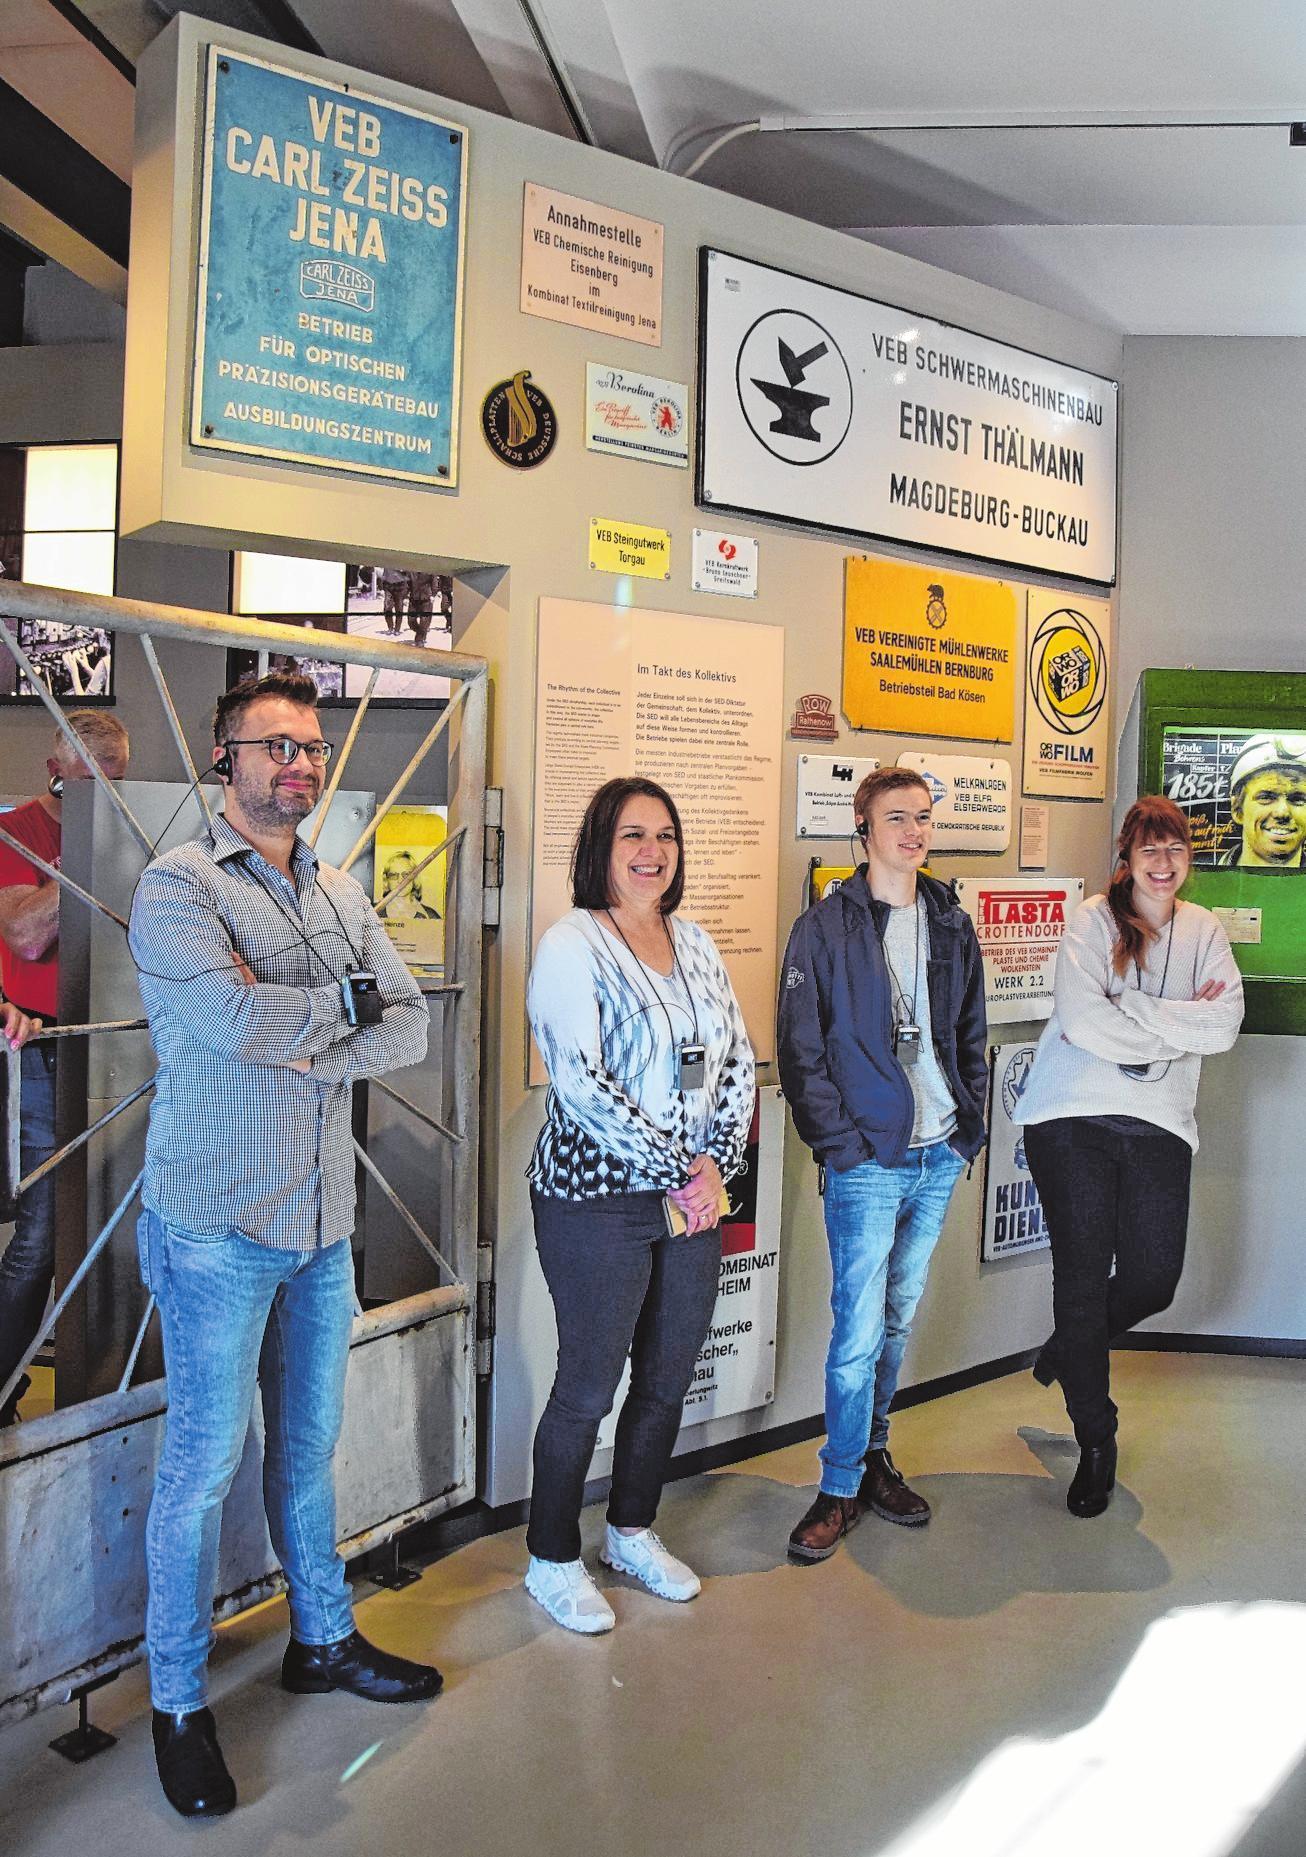 Sebastian Bünner, Anita Schmitt, Moritz Hüfner und Bernadette Köth lauschen den Ausführungen von Andreas Falge.